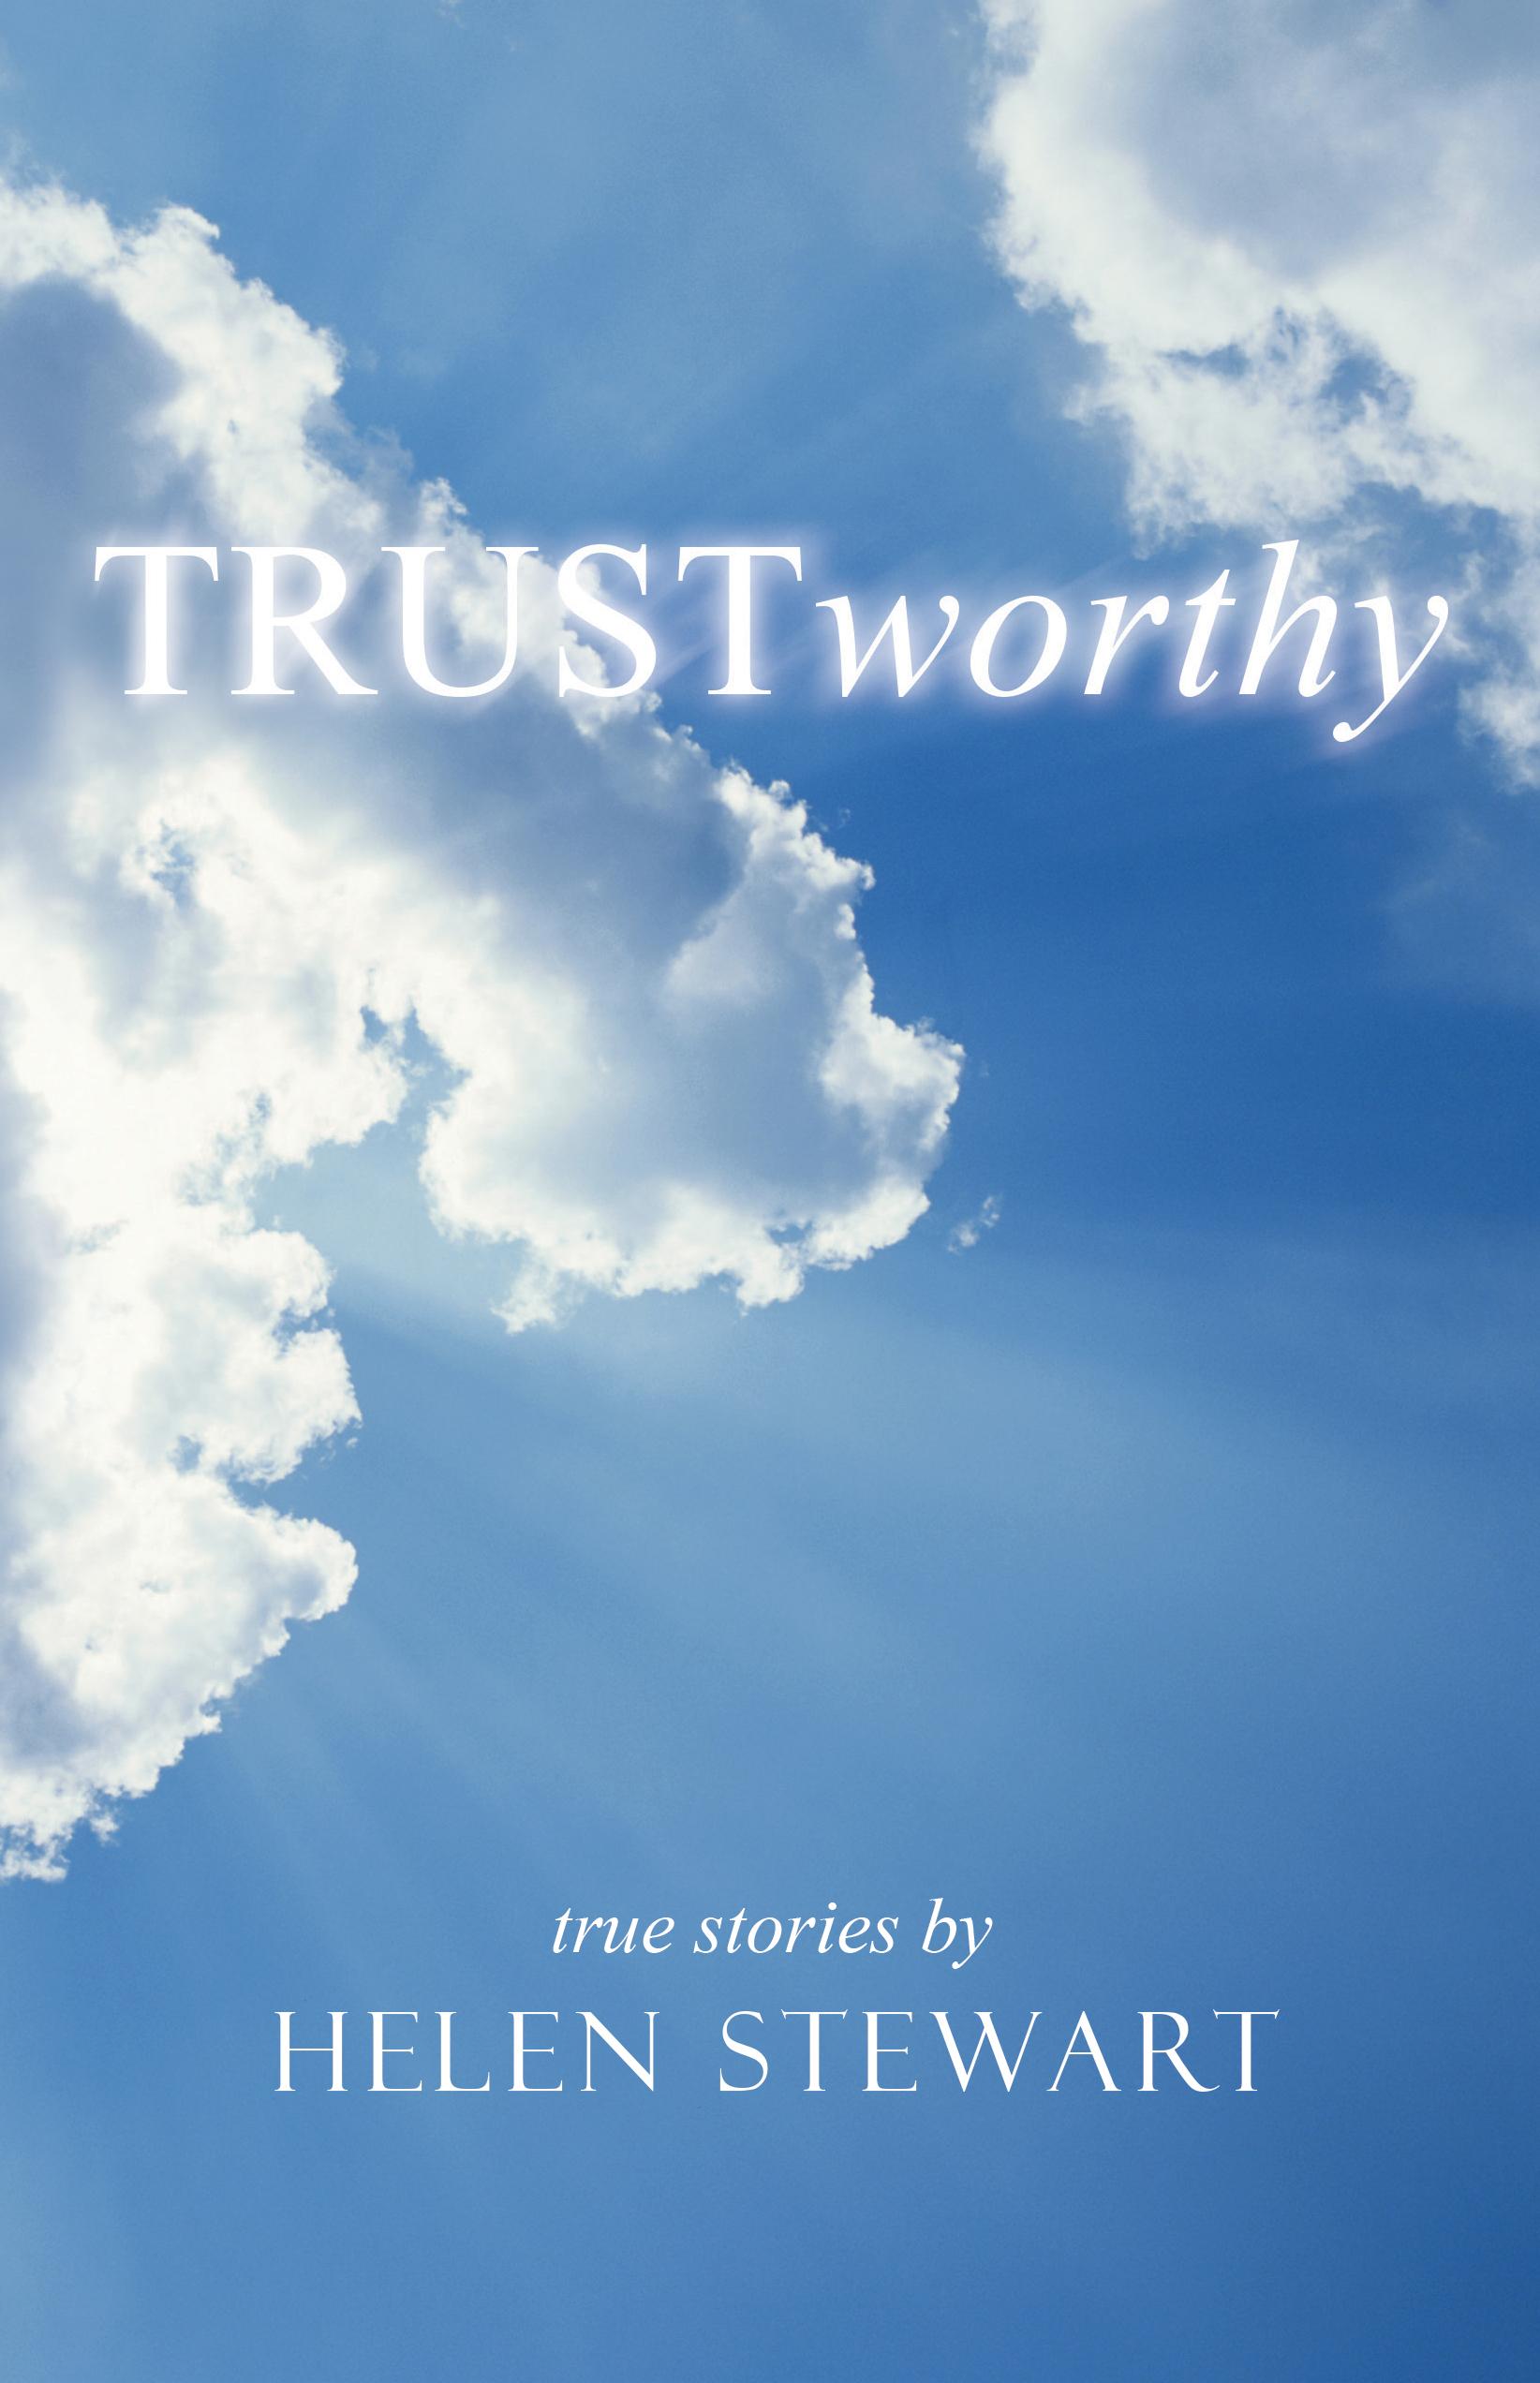 TRUSTworthy true stories by Helen Stewart